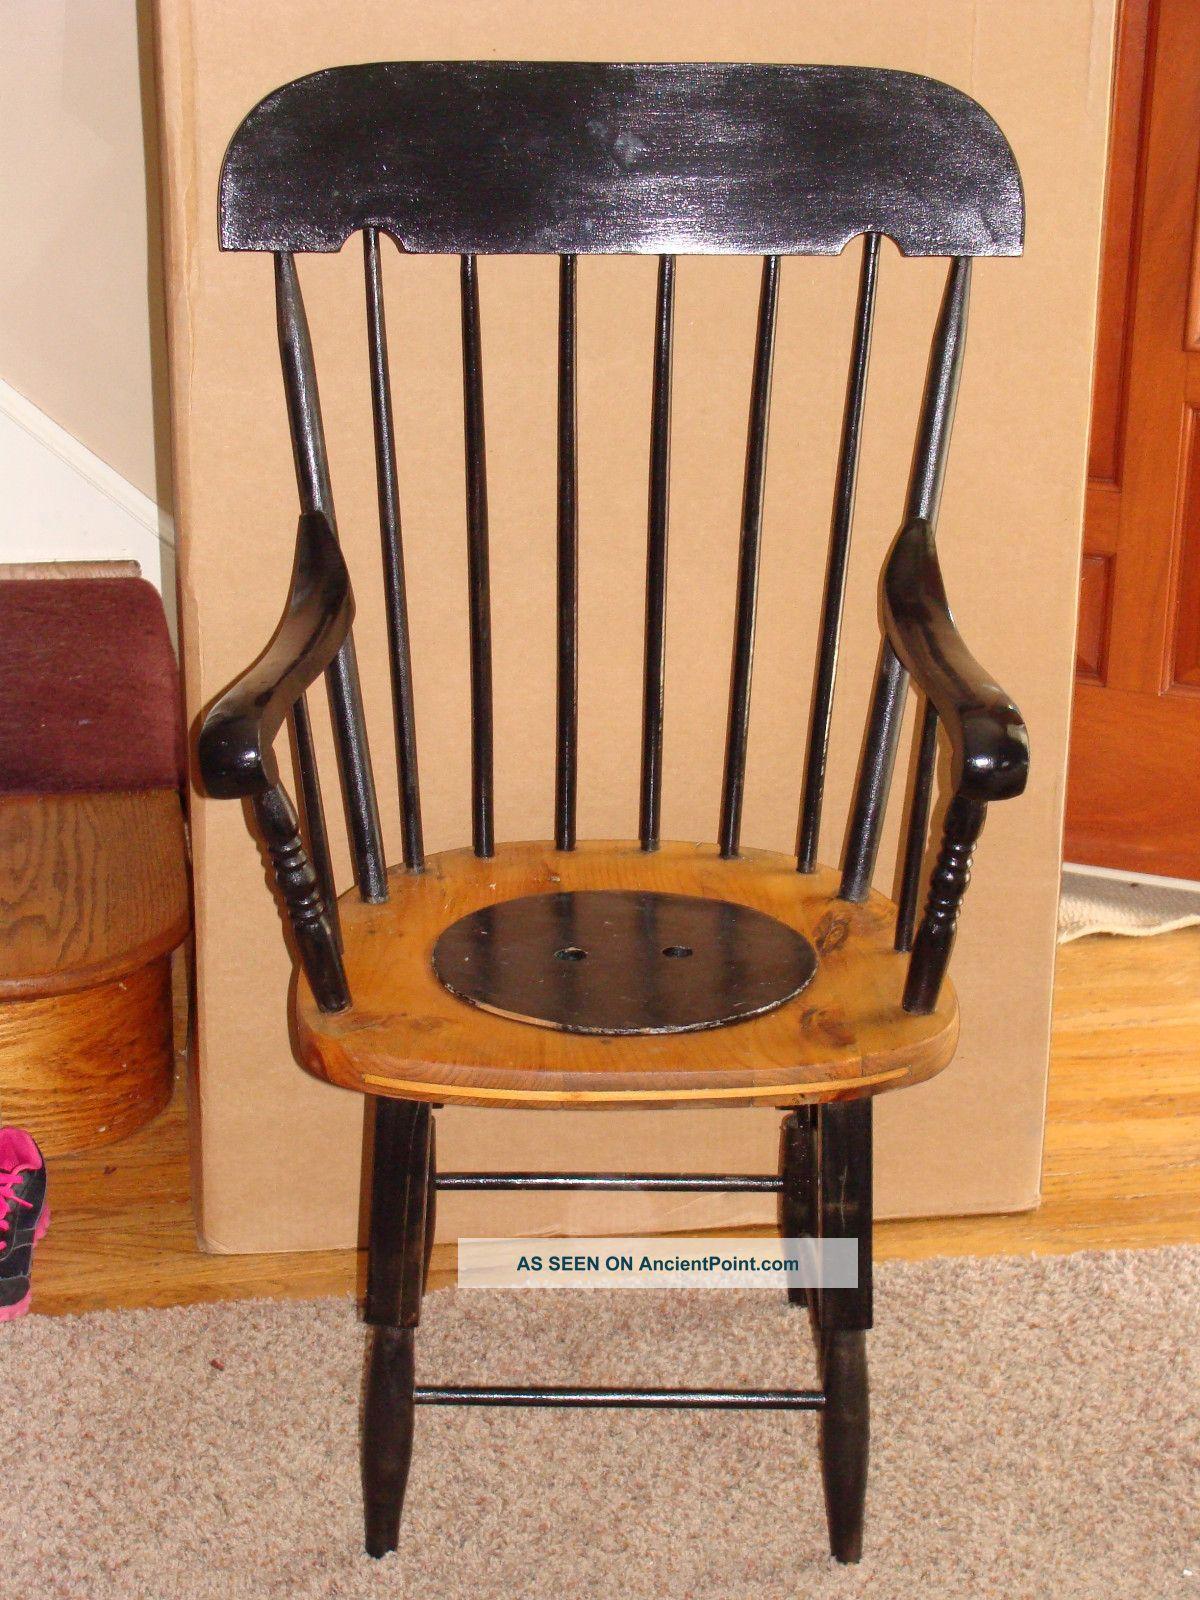 Antique adult potty chair